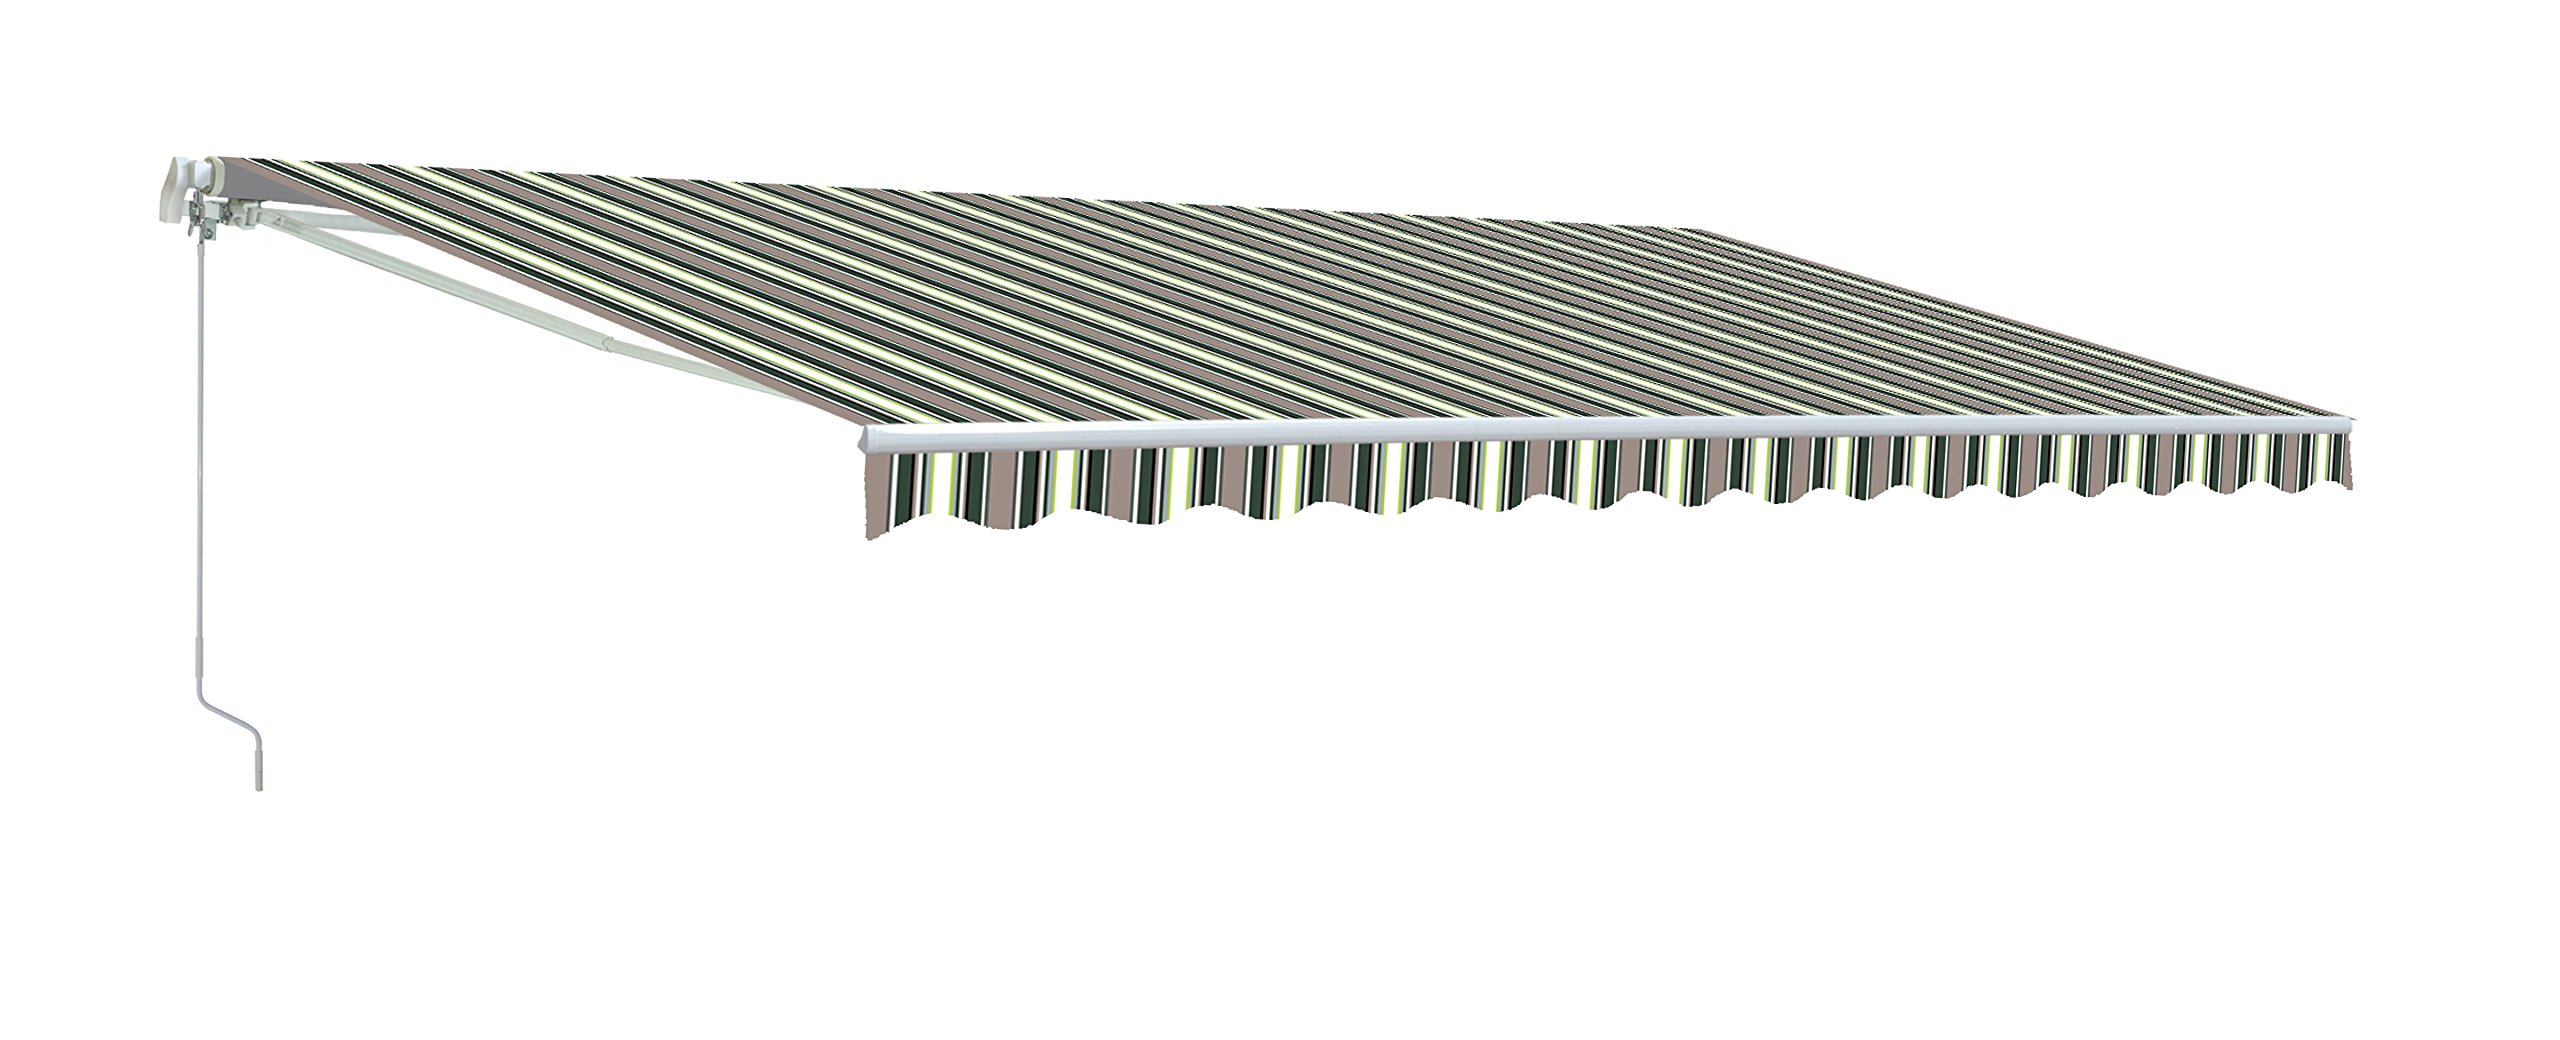 ALEKO AW12X10MSTRGR58 Retractable Patio Awning 12 x 10 Feet Multi-Stripe Green